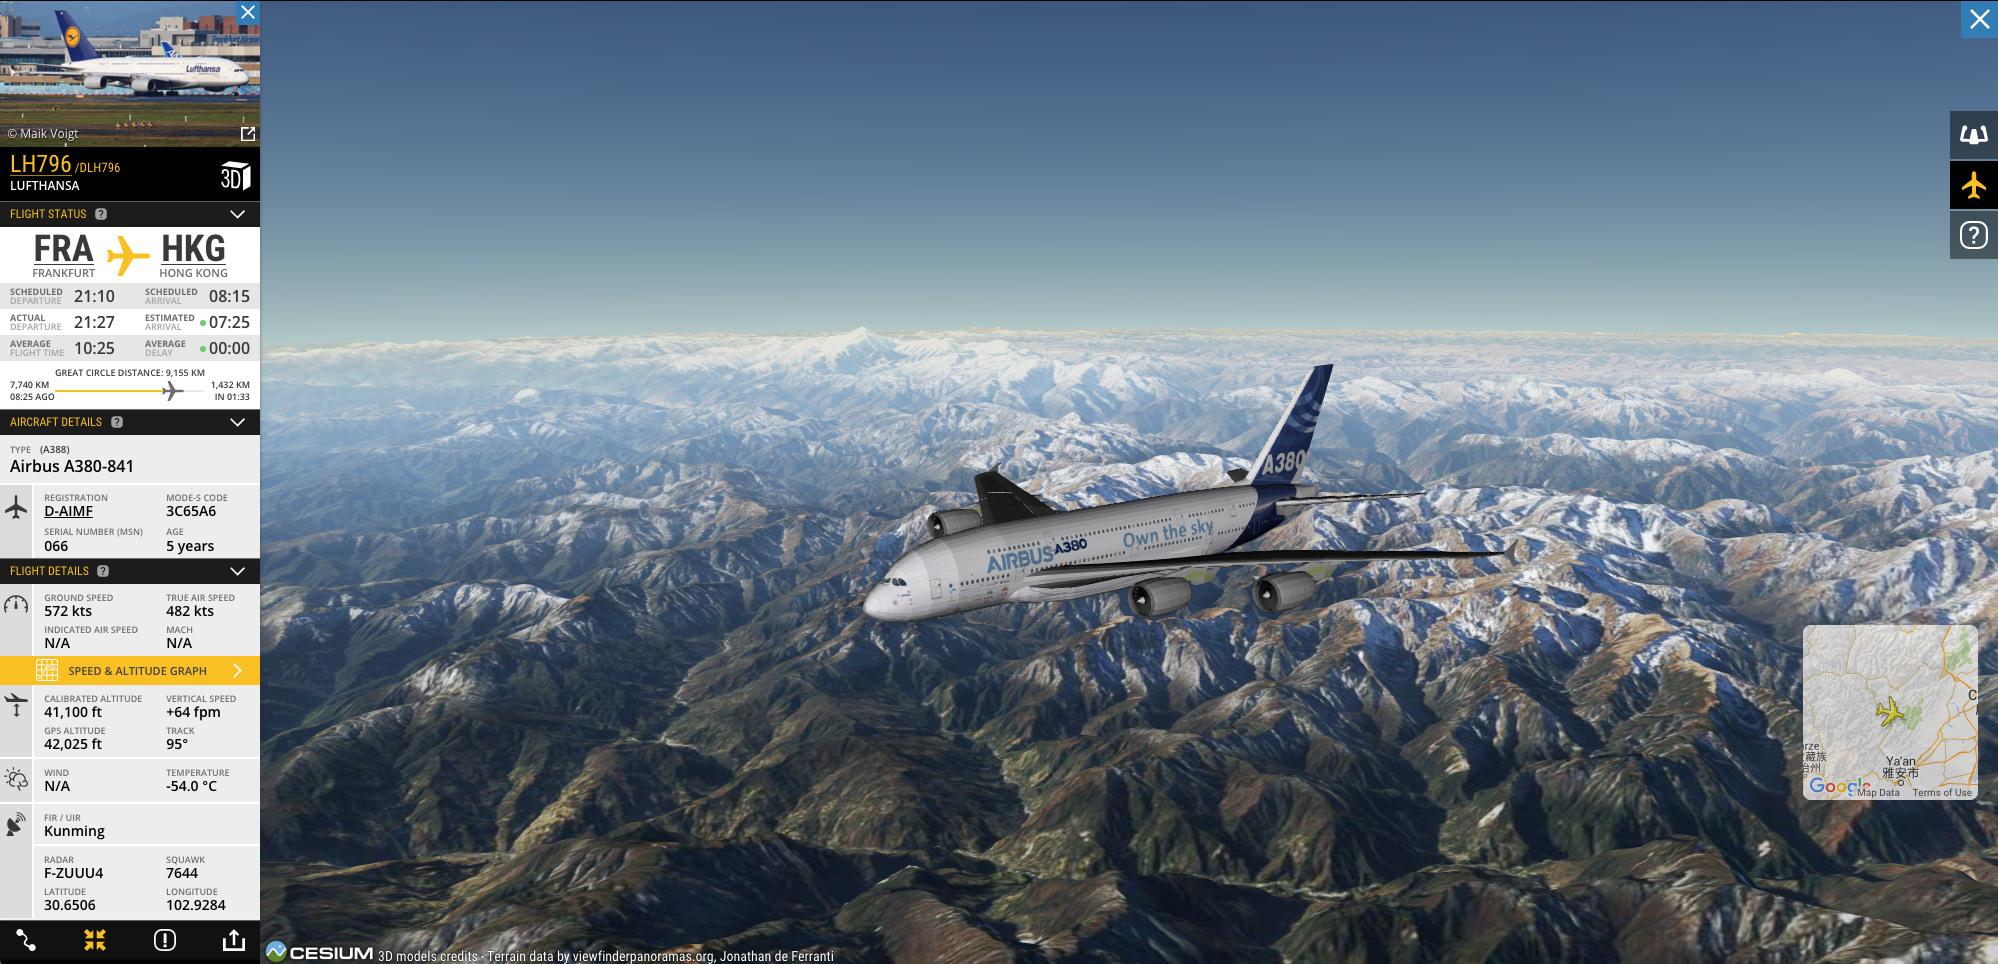 Introducing the new flightradar24 flightradar24 blog for 3d model viewer